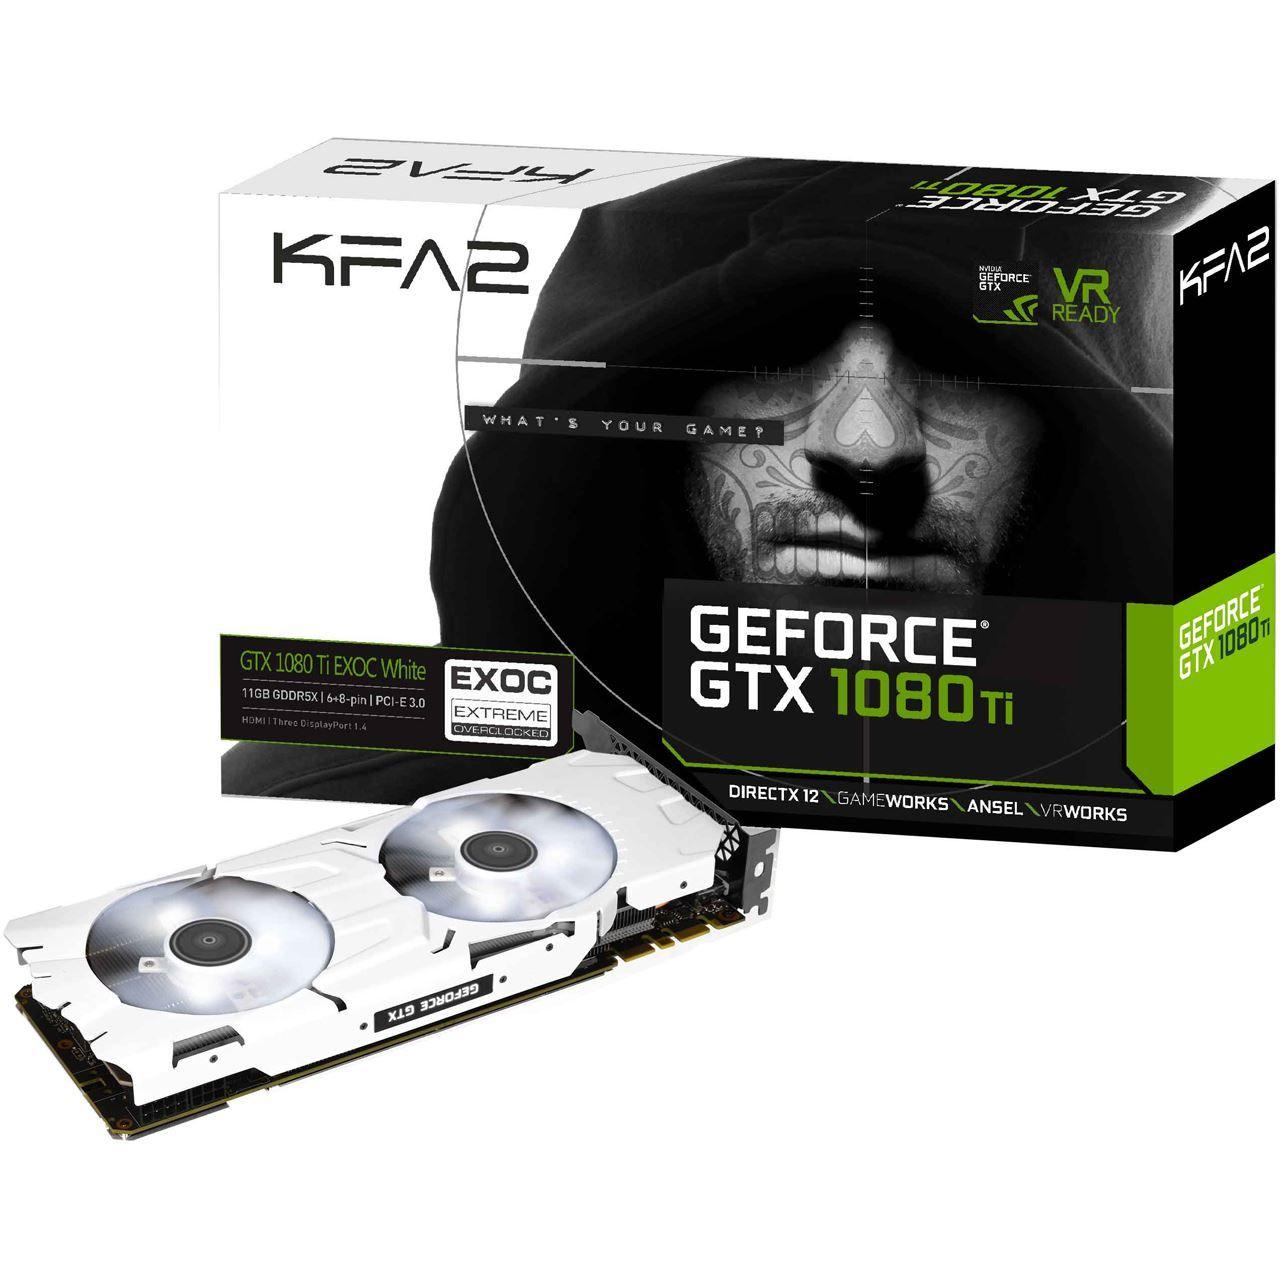 KFA2 GeForce GTX 1080 Ti EXOC White Aktiv PCIe 3.0 x16